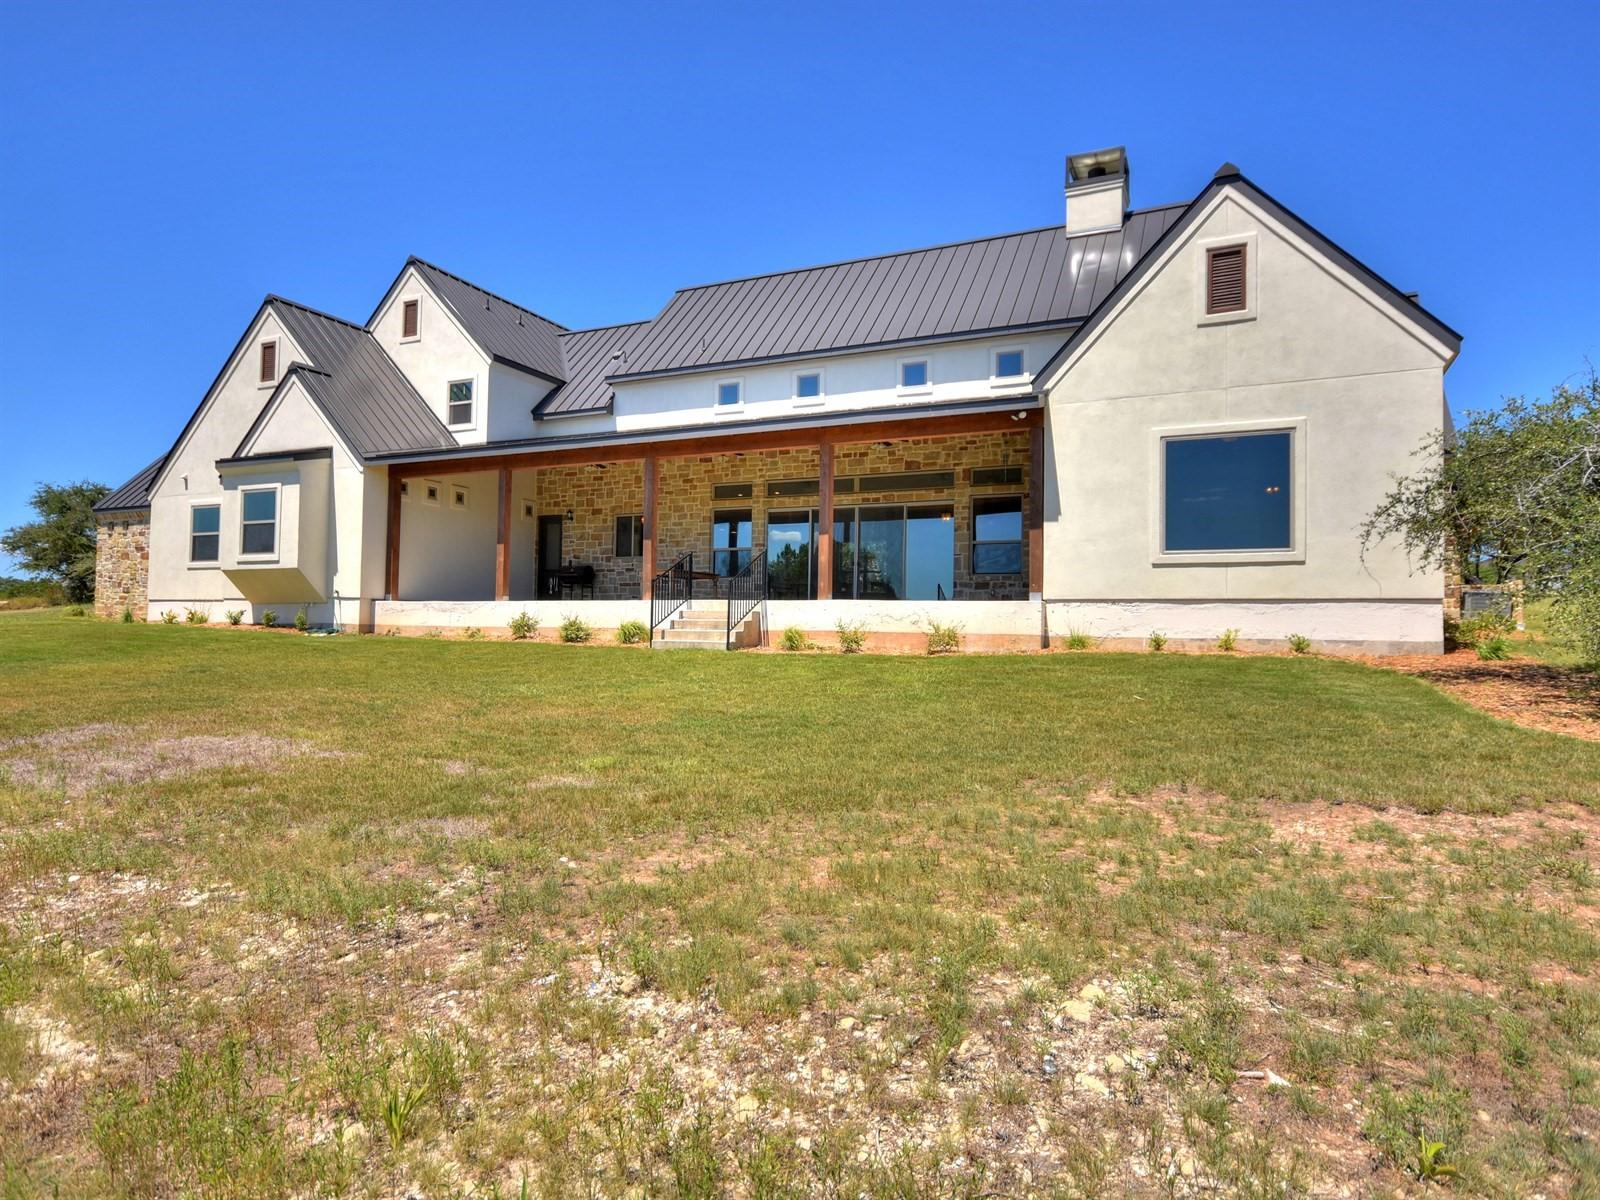 8817 Bellancia Dr, Austin TX 78738   MLS #8504774   Home for Sale Belvedere Austin